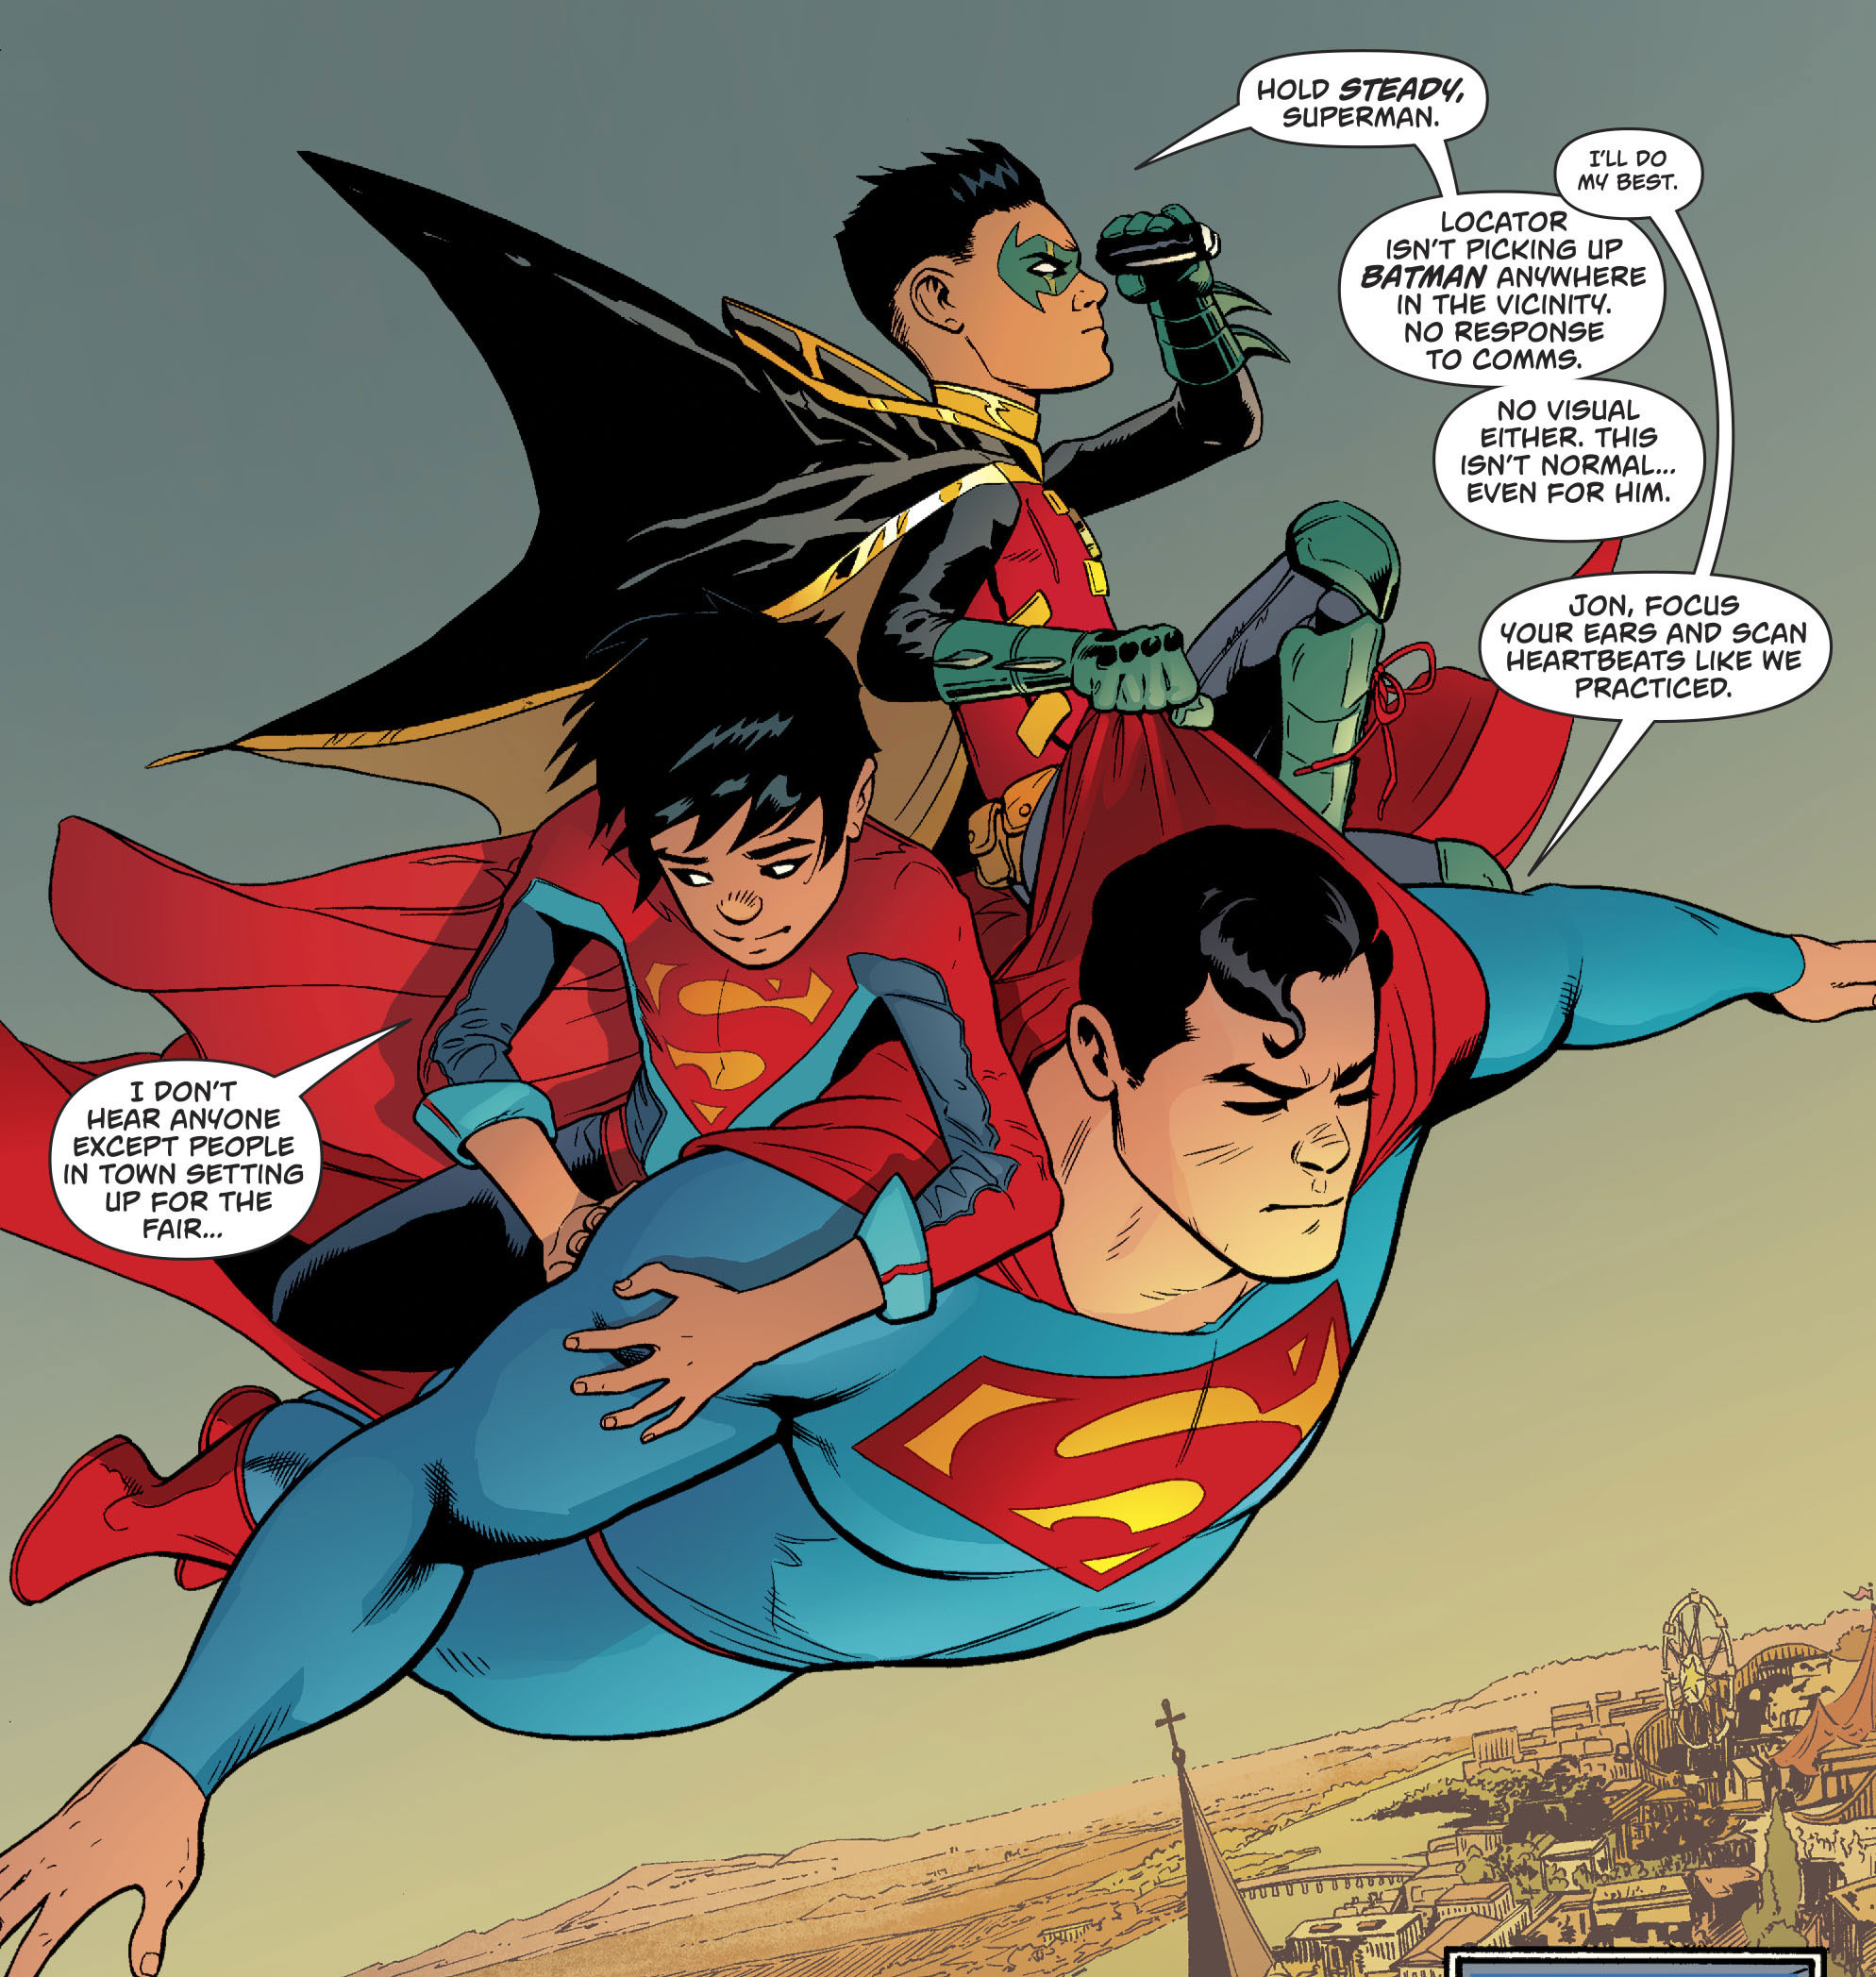 Superman, Superboy And Robin (Superman Vol 4 #21)